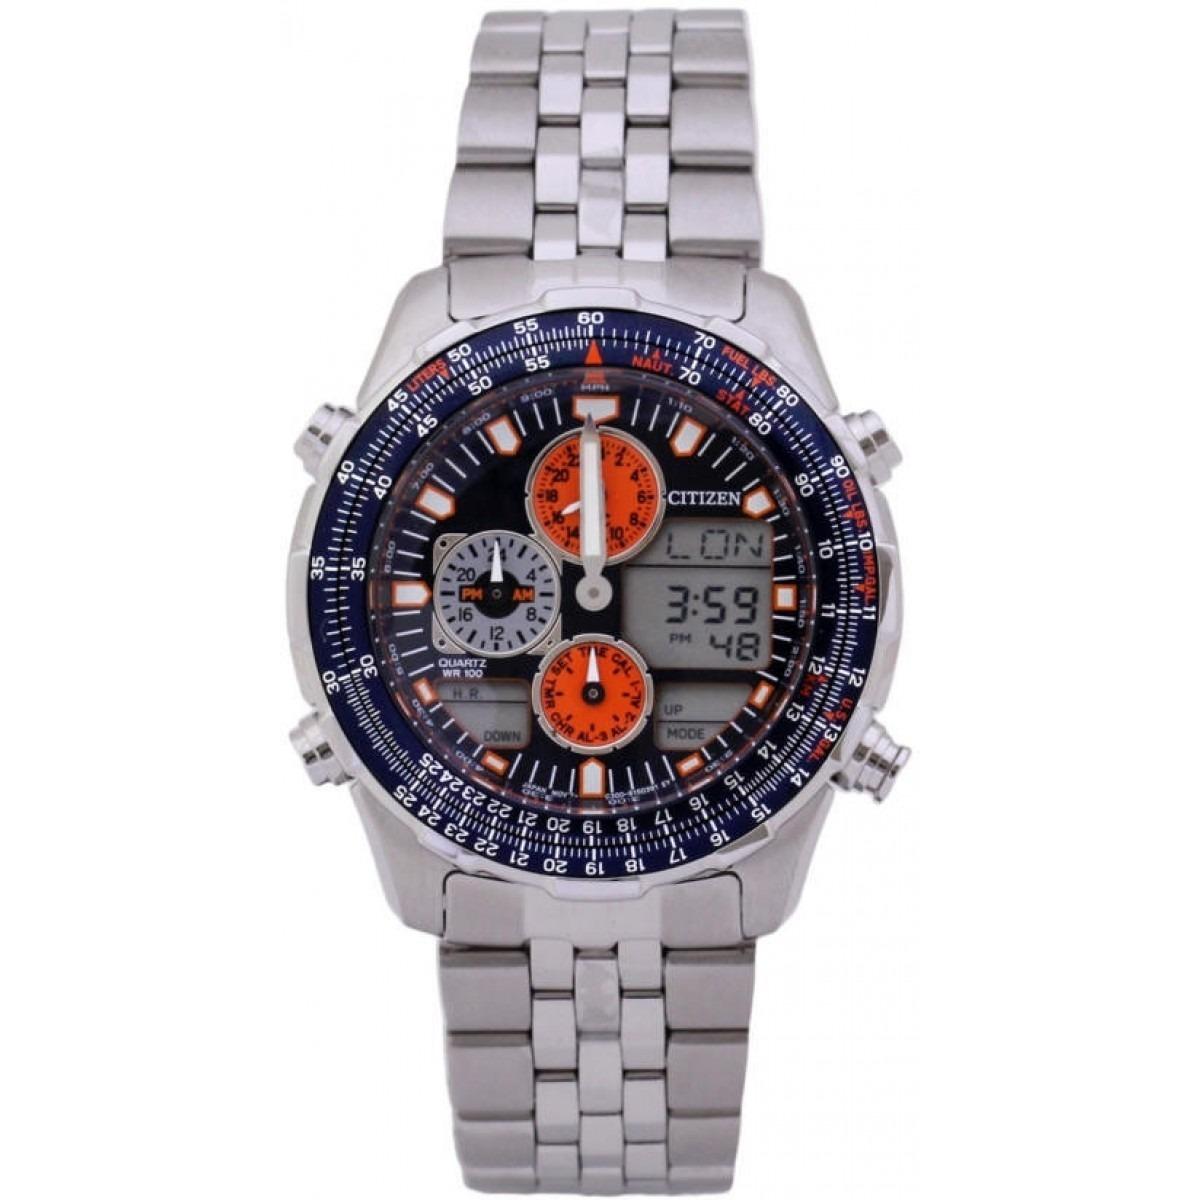 d632f3cd5c3 relógio citizen navihawk promaster ar jn0121-82l. Carregando zoom.